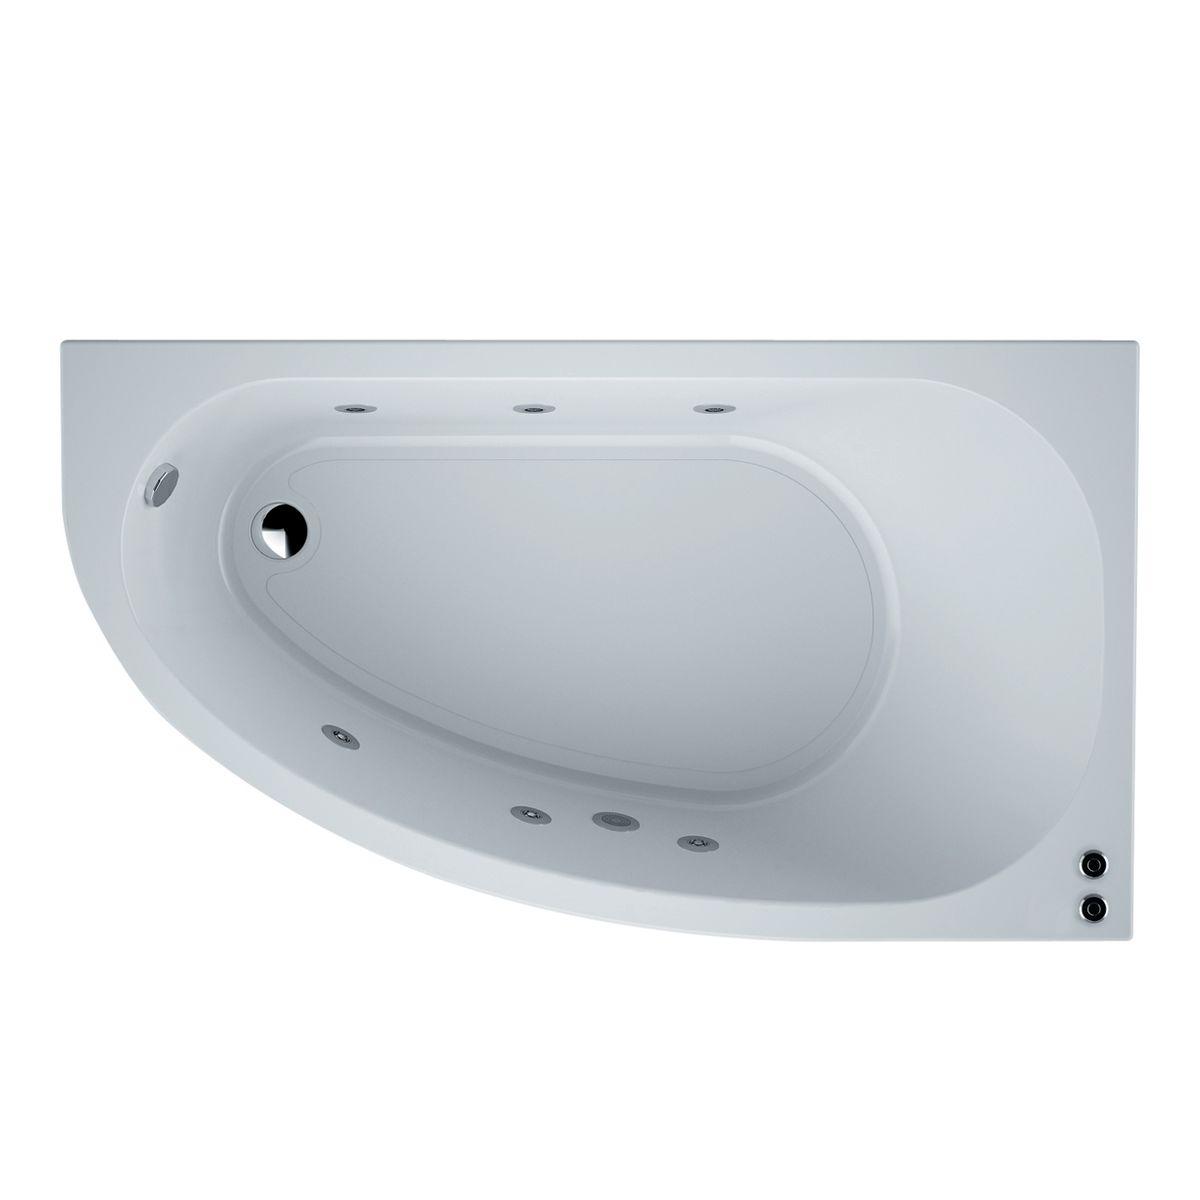 Top Vasca idromassaggio Tripoli confort 160 x 90 cm: prezzi e offerte  QS82